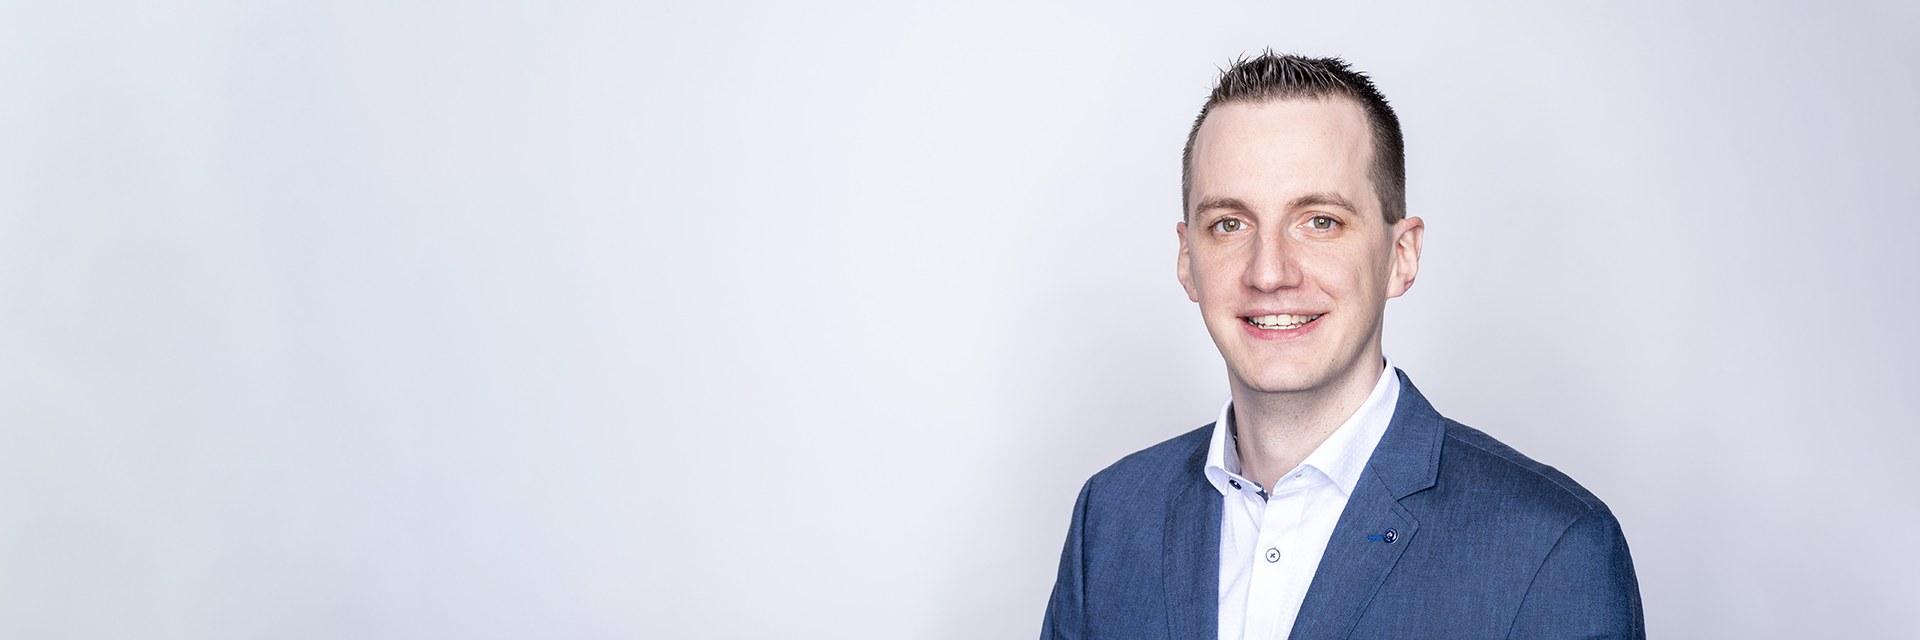 Michael Böller